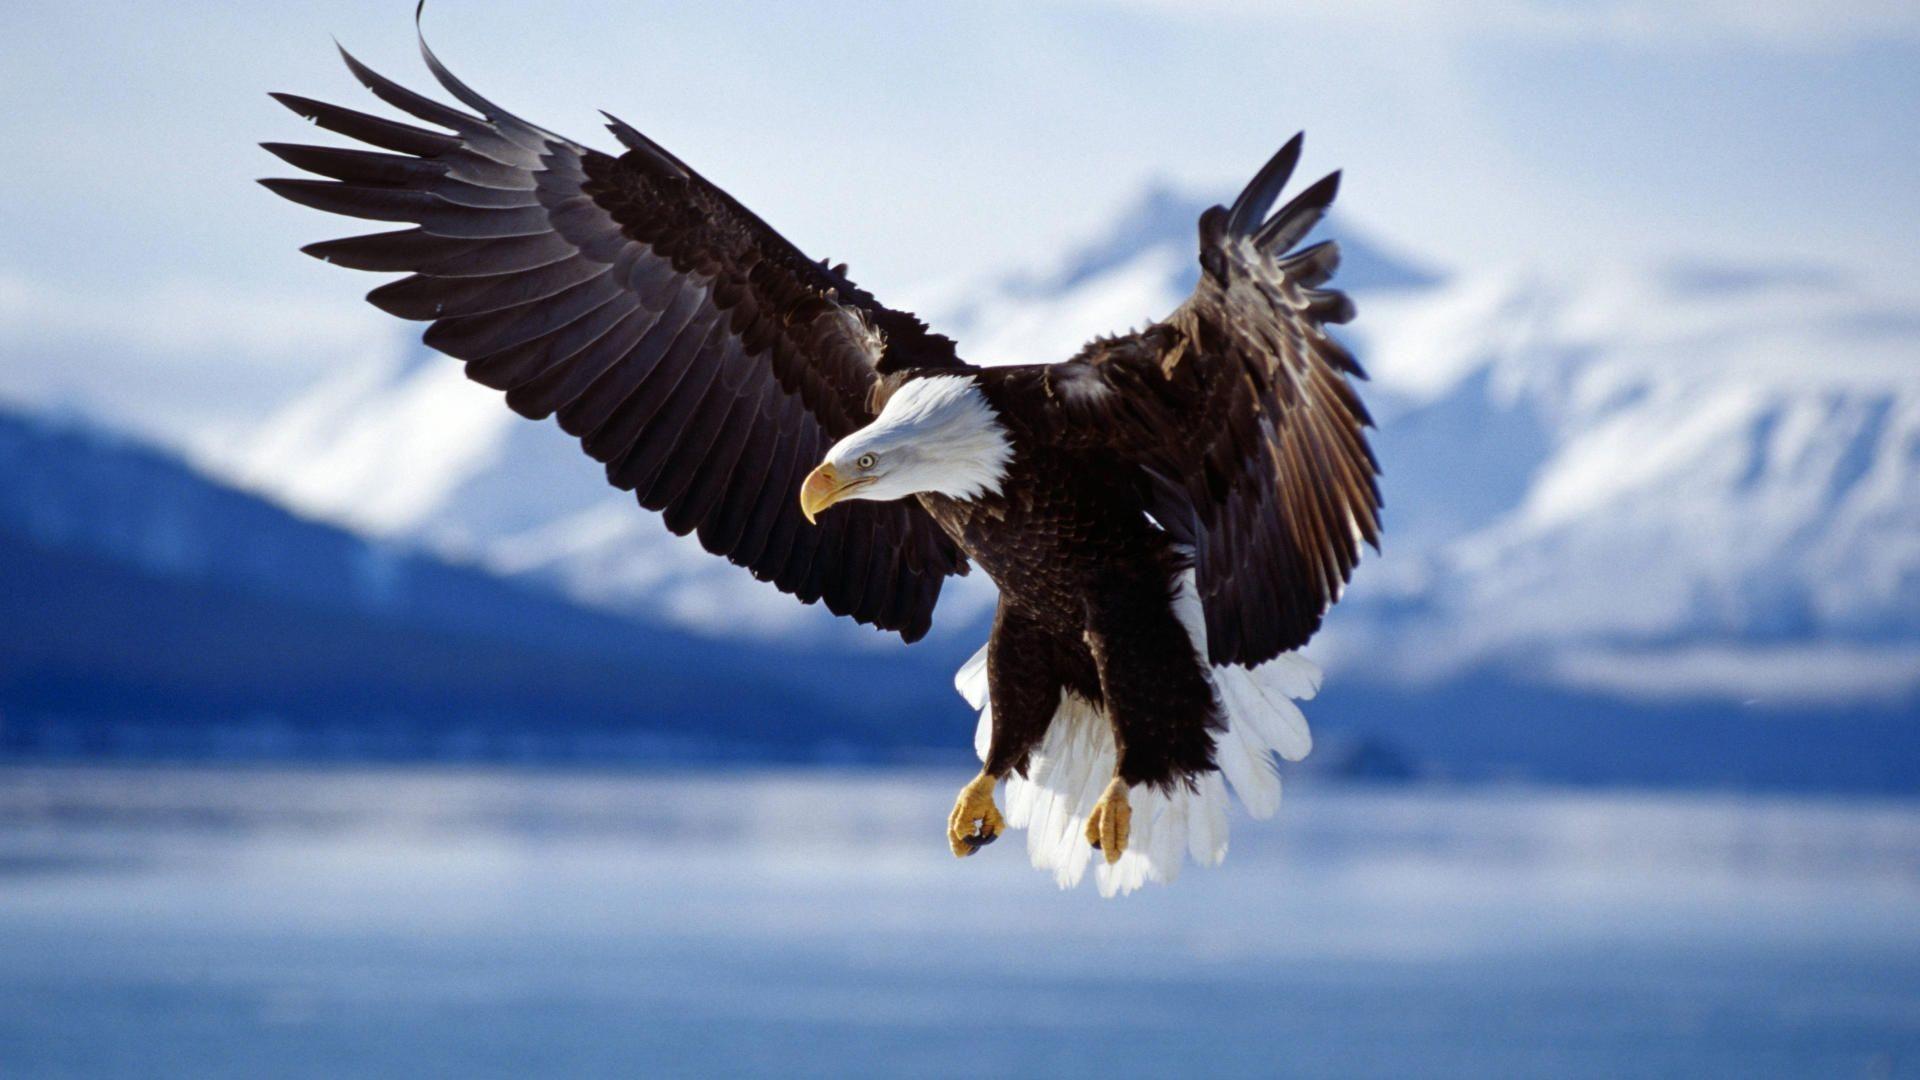 40 Bald Eagle Wallpaper High Resolution On Wallpapersafari